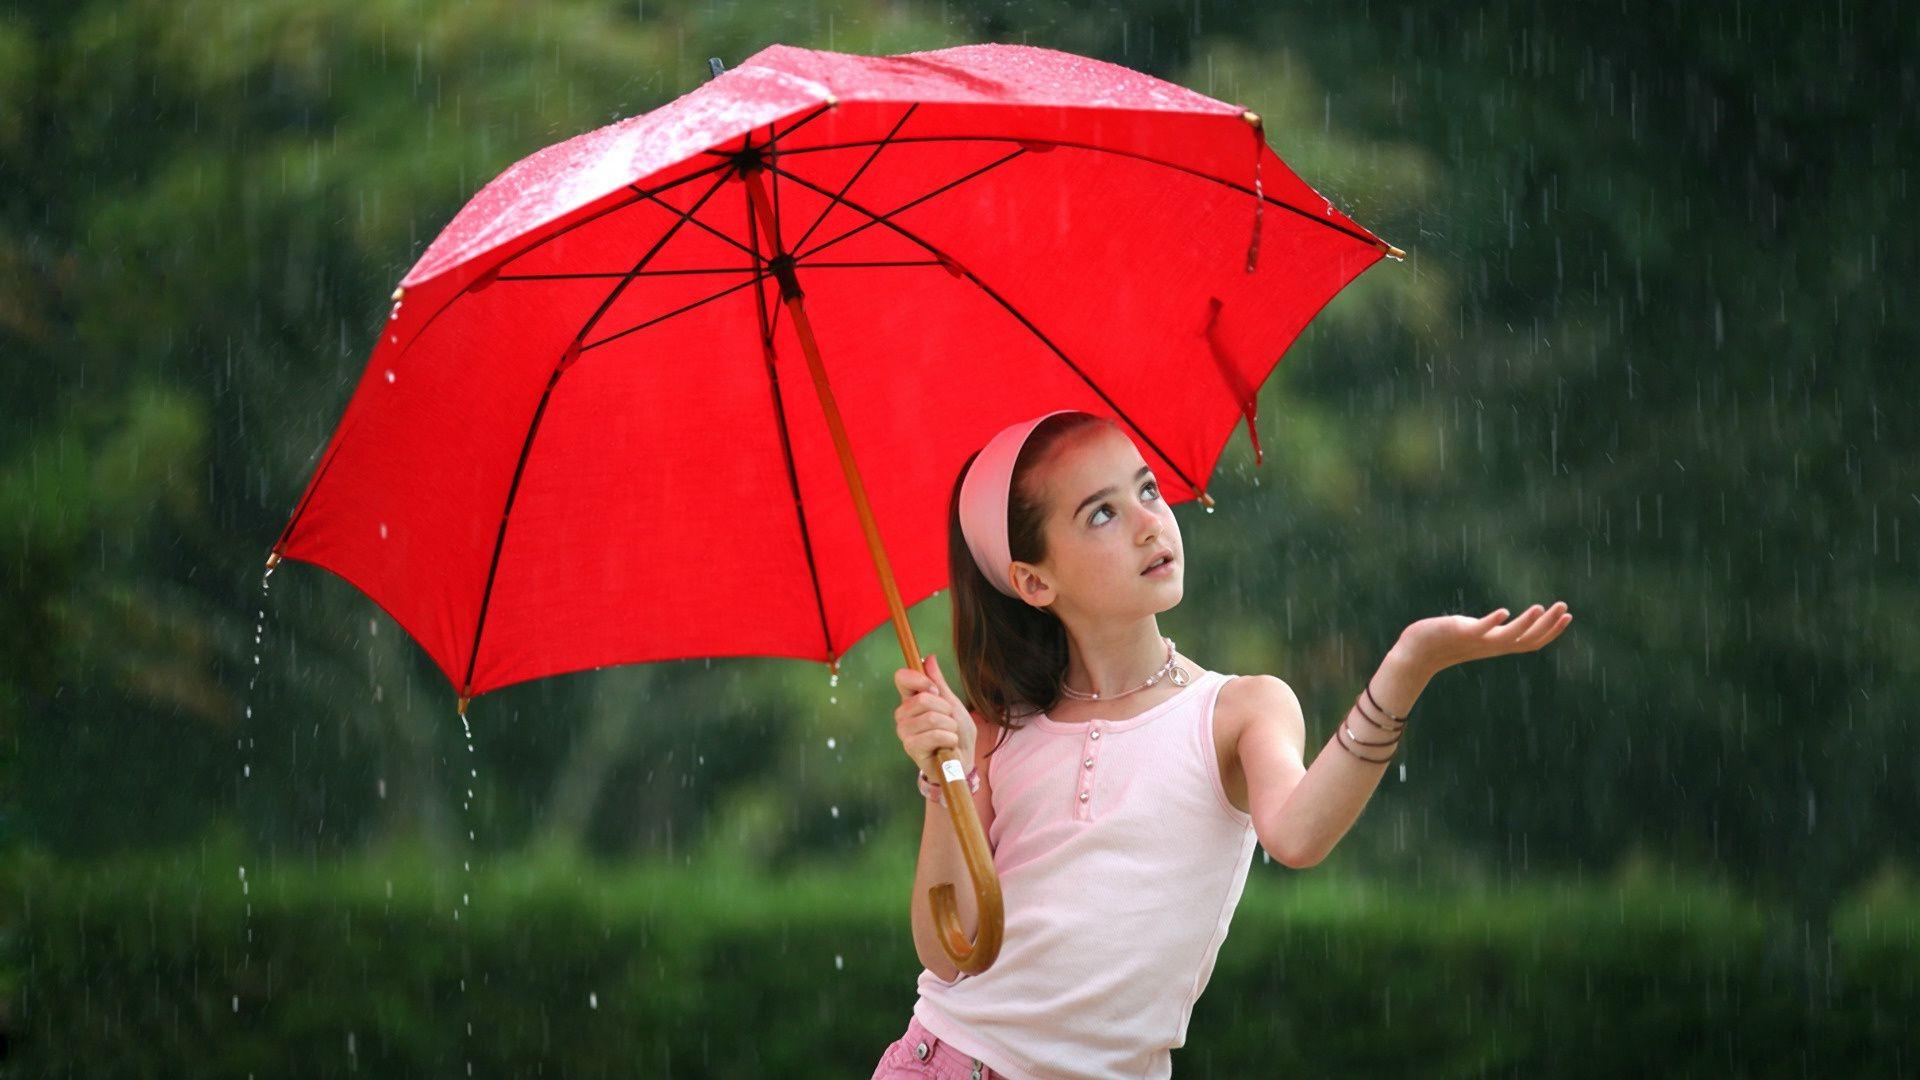 Children Umbrella Girl Rain Woman Outdoors Nature Summer - Baby With Umbrella In Rain - HD Wallpaper